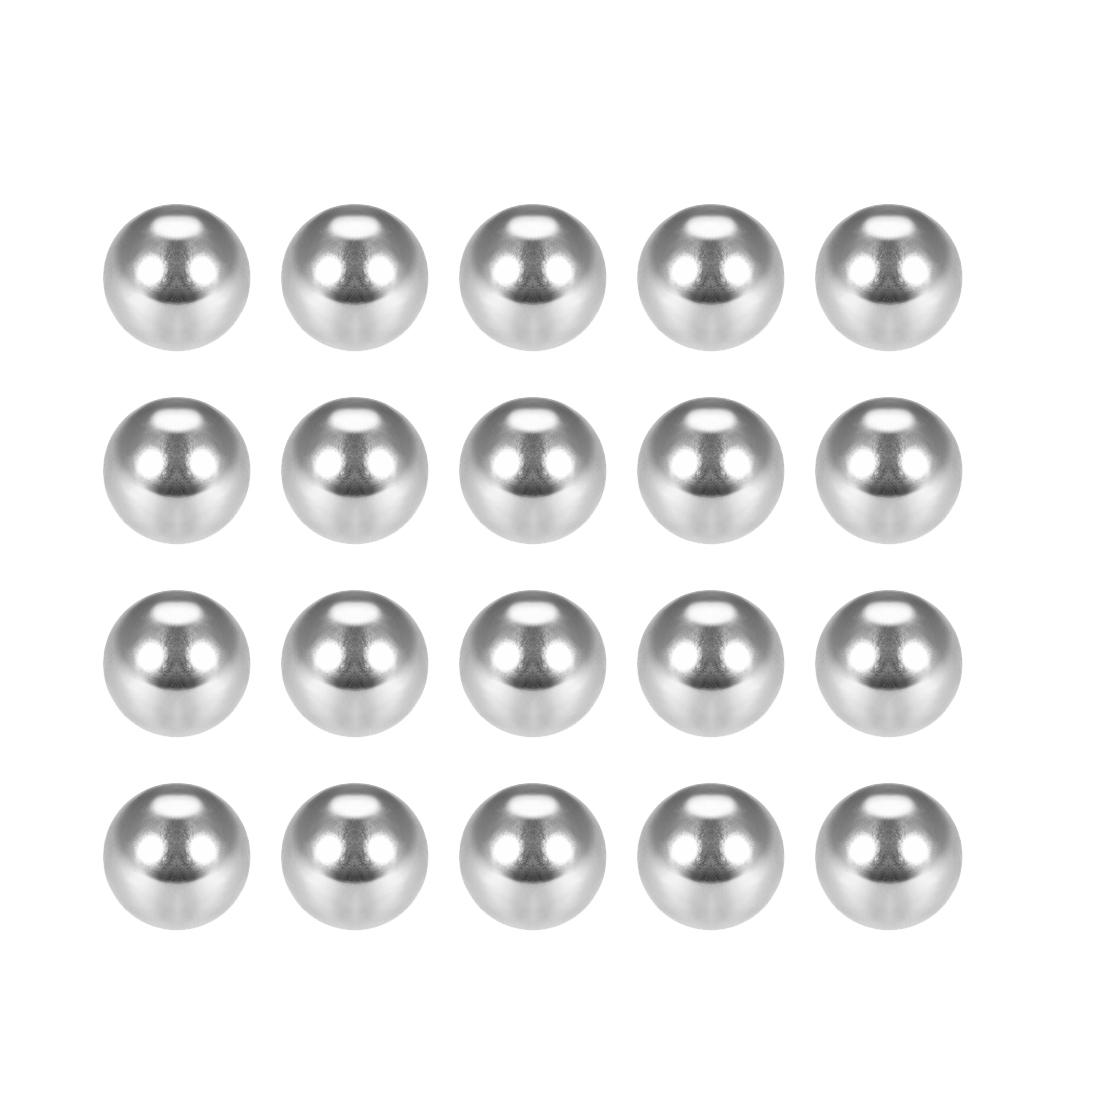 4mm Precision Chrome Steel Bearing Balls G25 100pcs